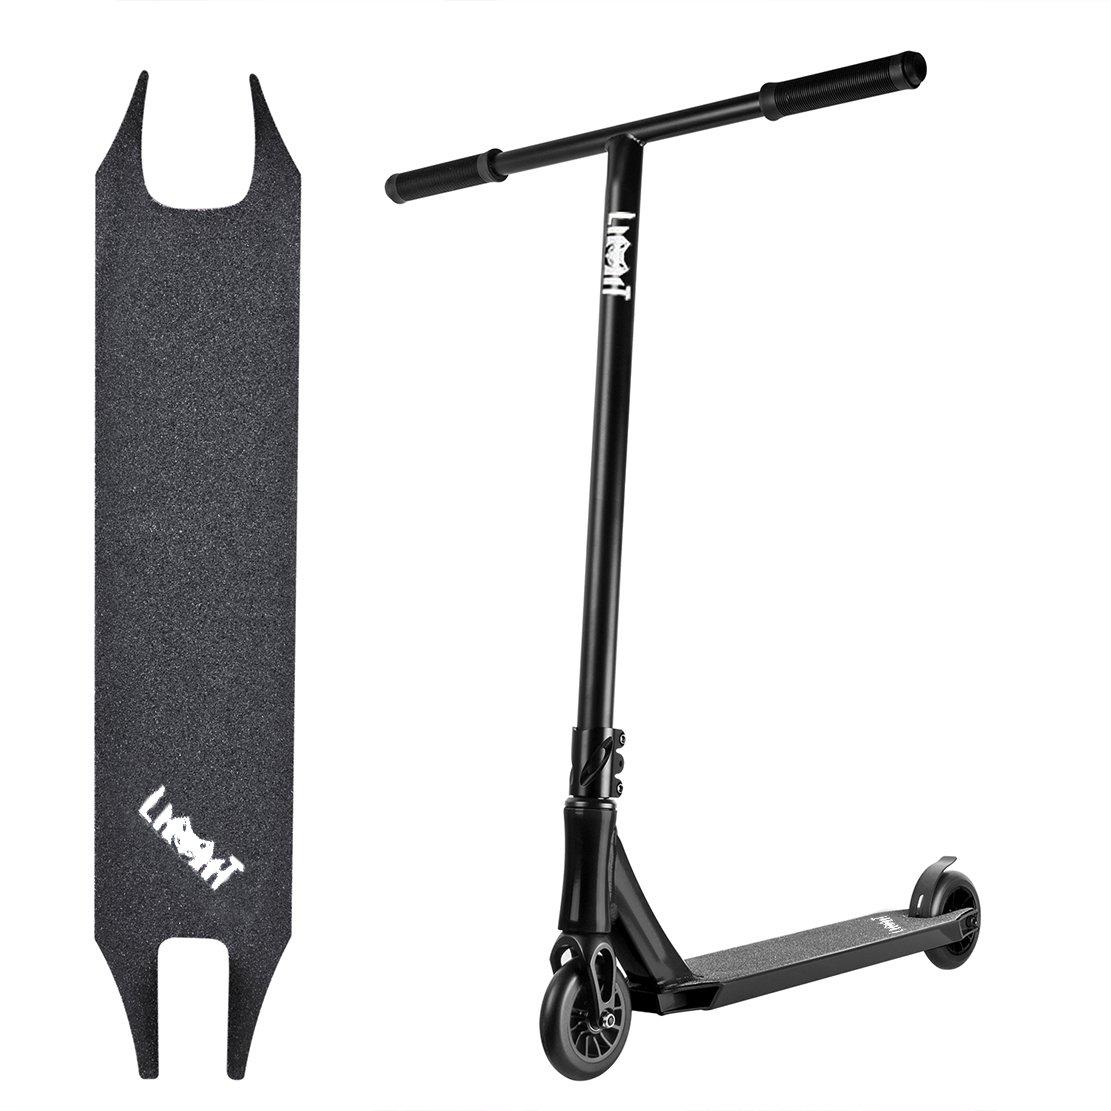 5 wisdoms Pro Stunt Scooter for Intermediate and Advanced Rider (B-black)